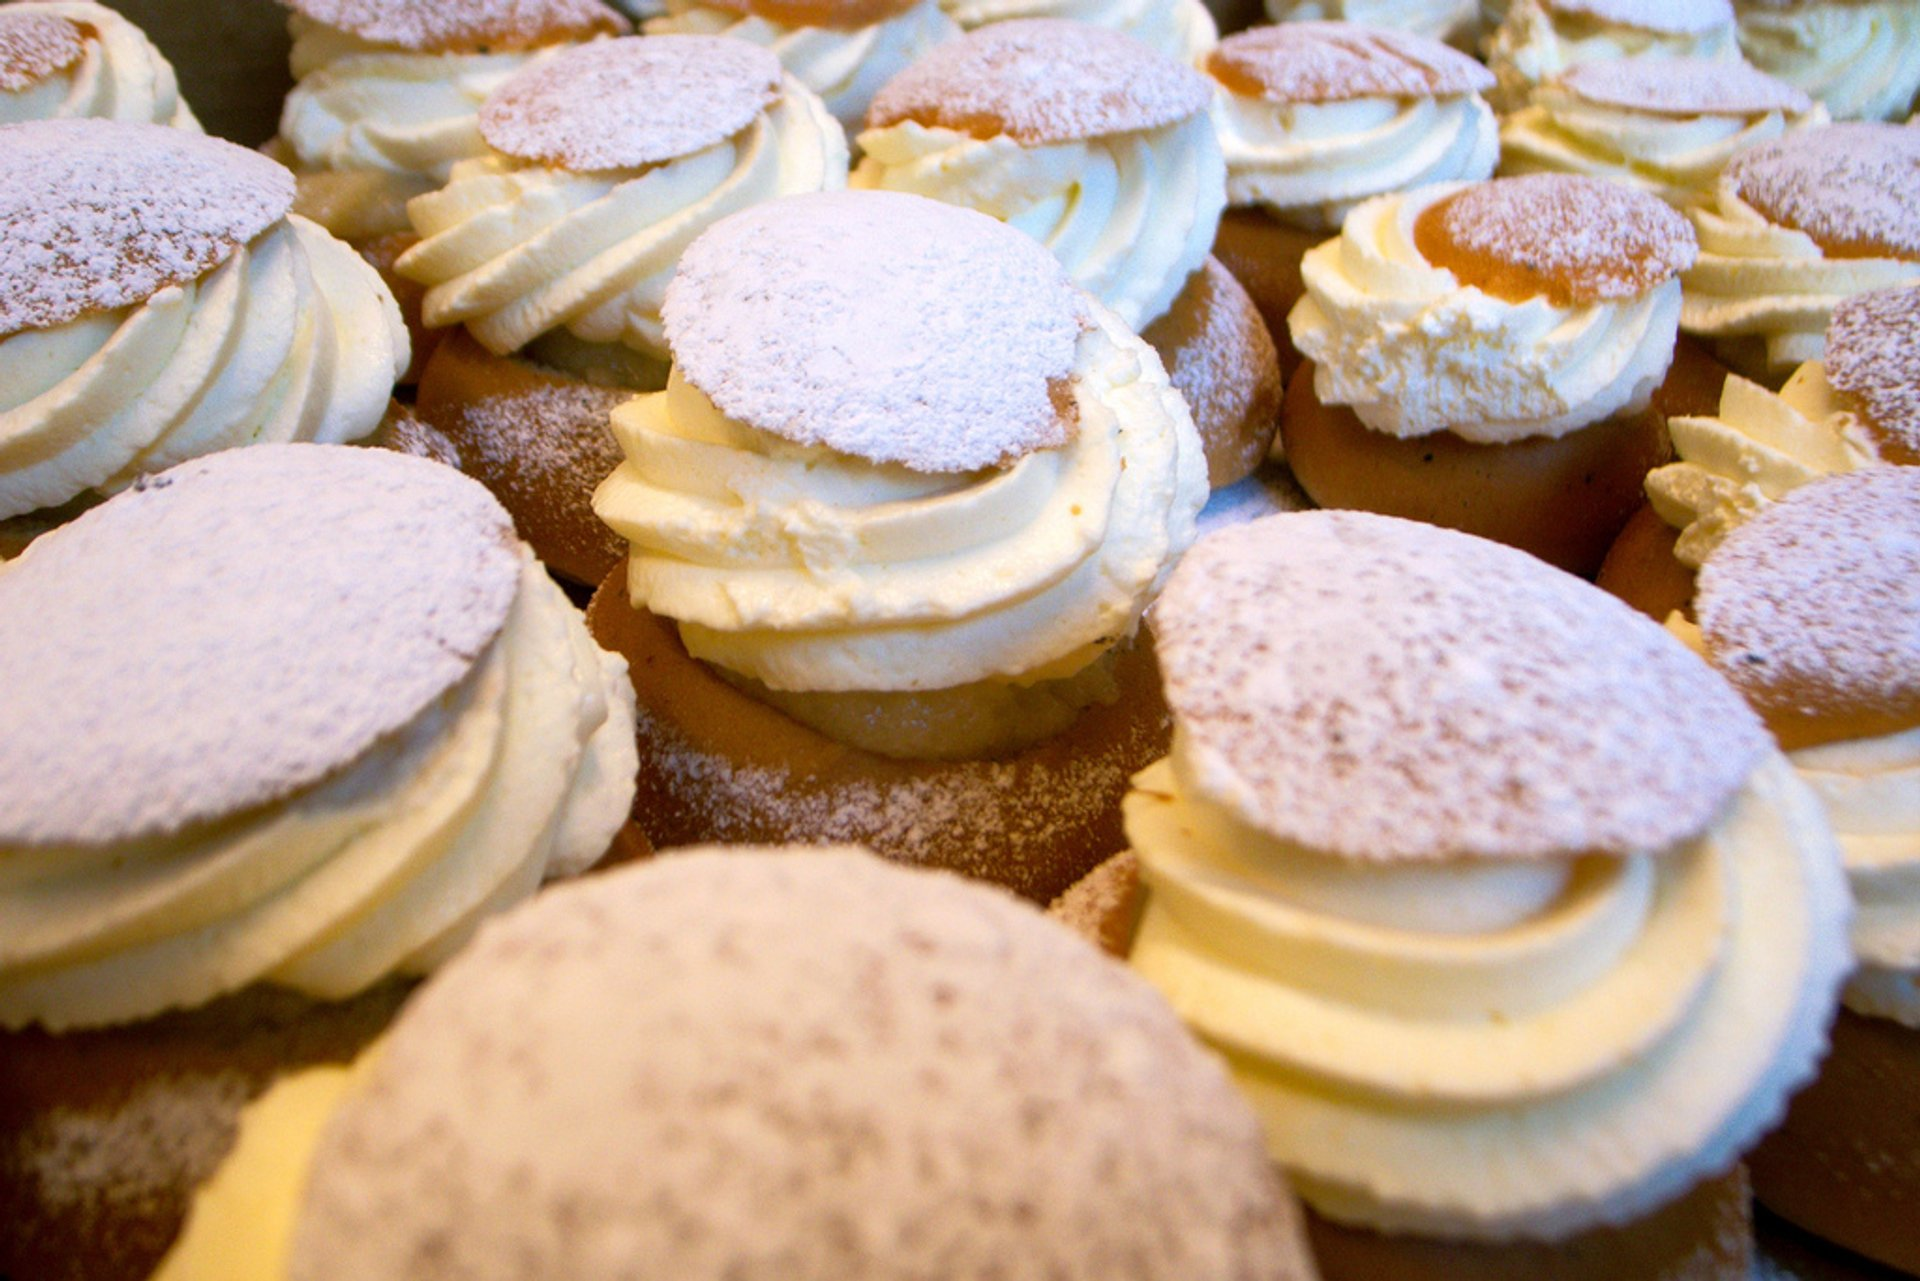 Semla Dessert in Sweden 2020 - Best Time